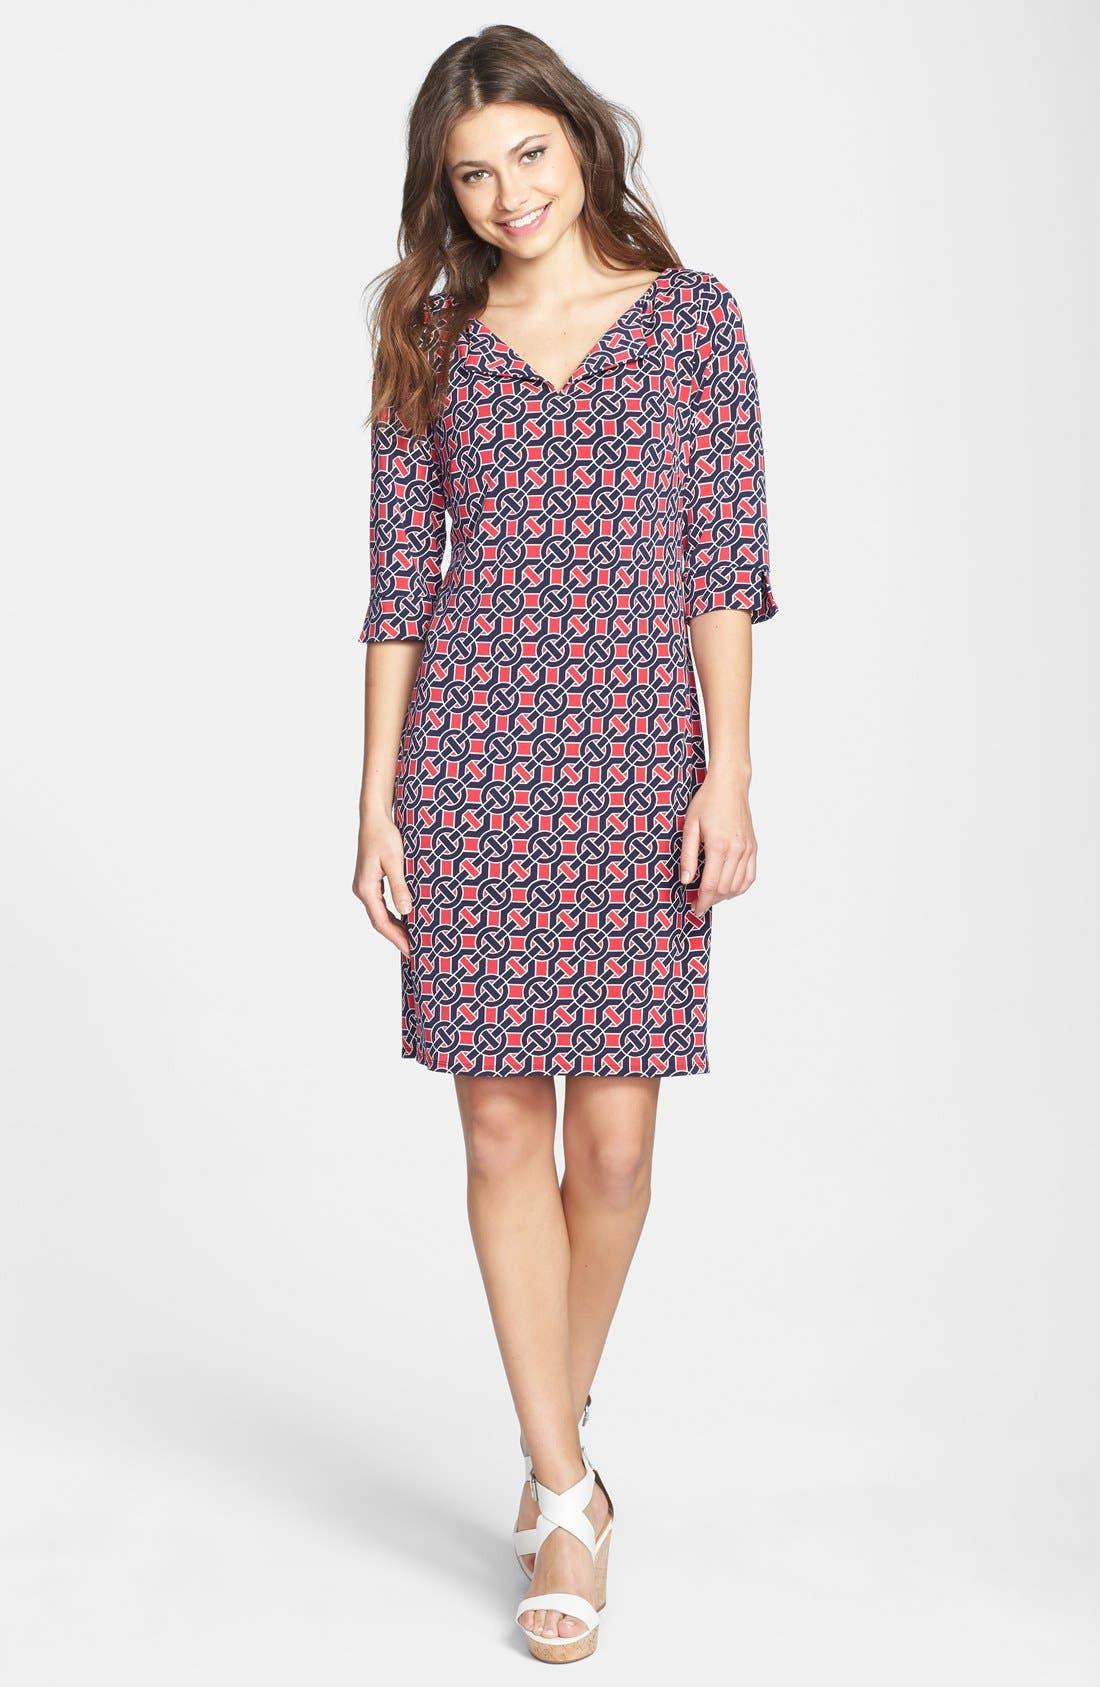 Alternate Image 1 Selected - Laundry by Shelli Segal Print Jersey Shift Dress